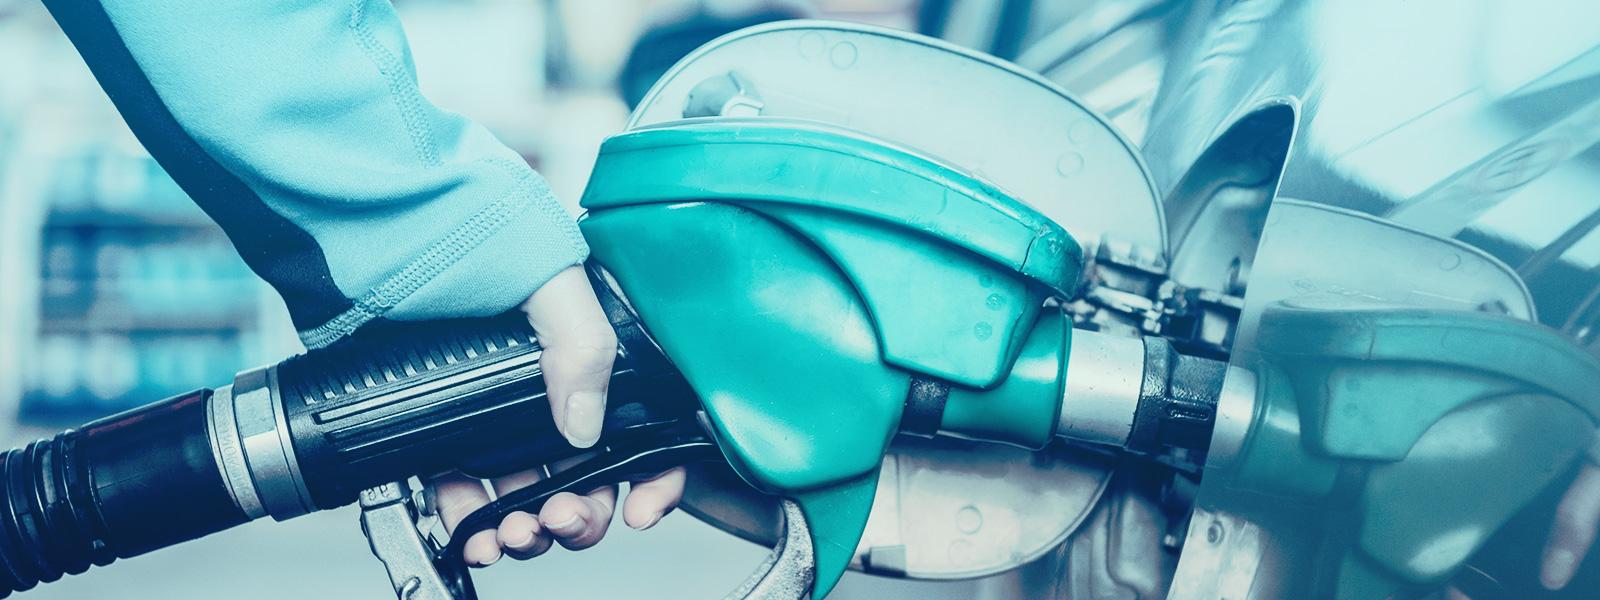 ceabs-blog-alcool-gasolina-aprenda-calcular-melhor-custo-beneficio